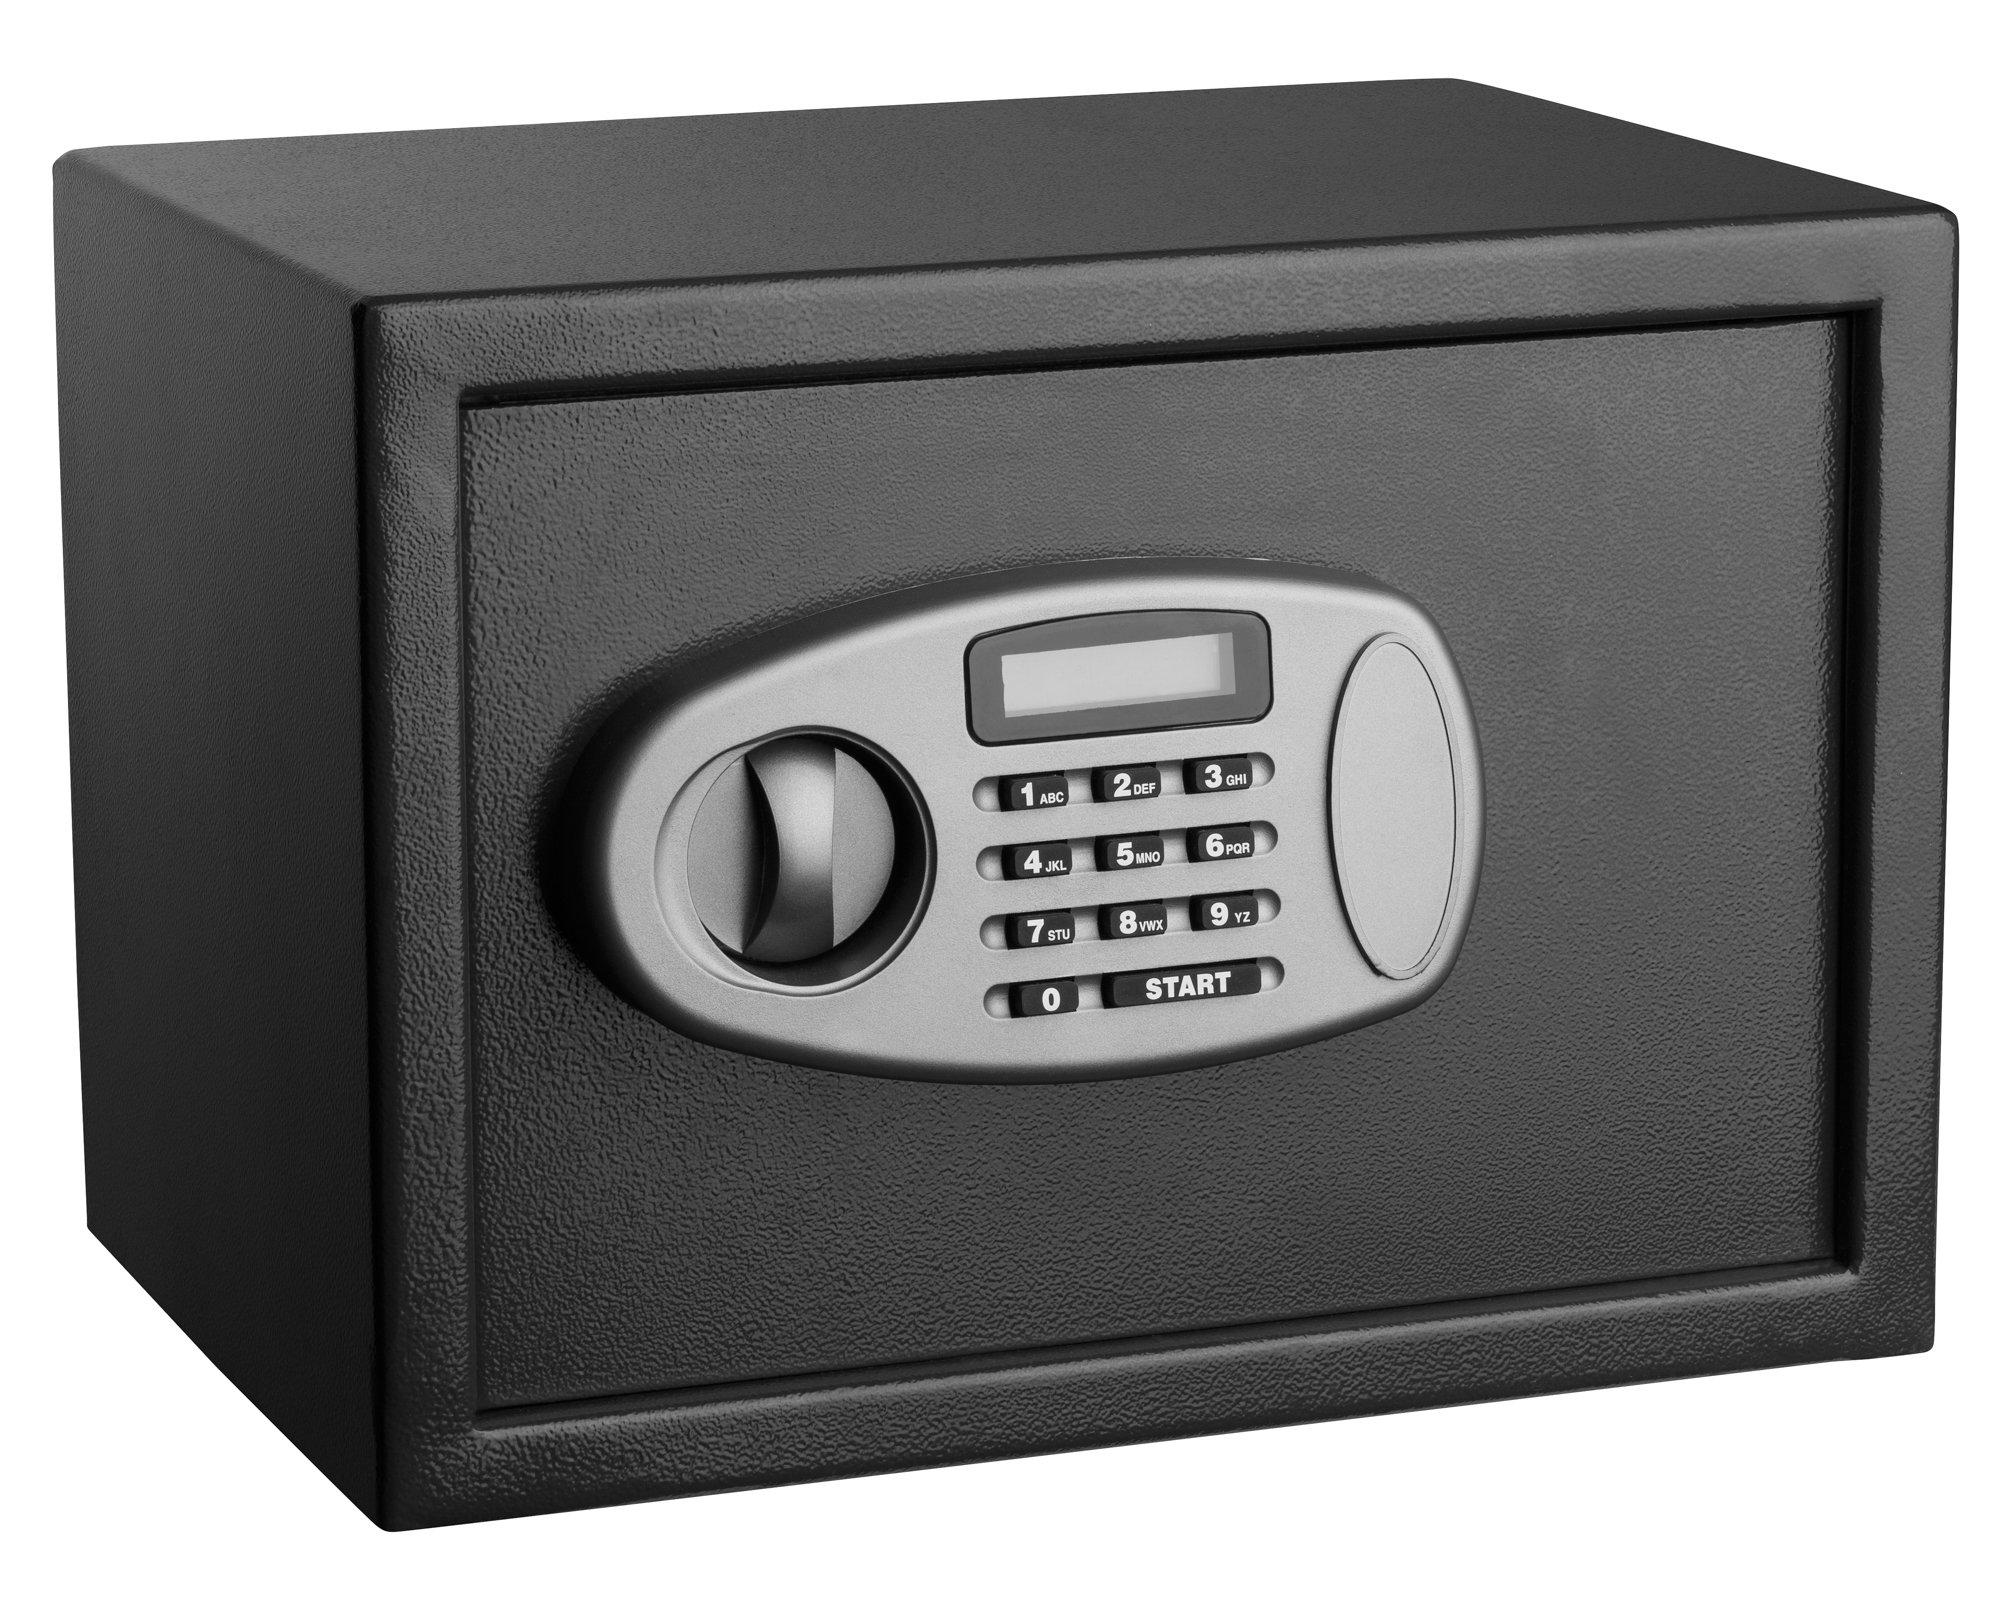 AdirOffice Security Safe with Digital Lock - Black - 0.5 Cubic Feet